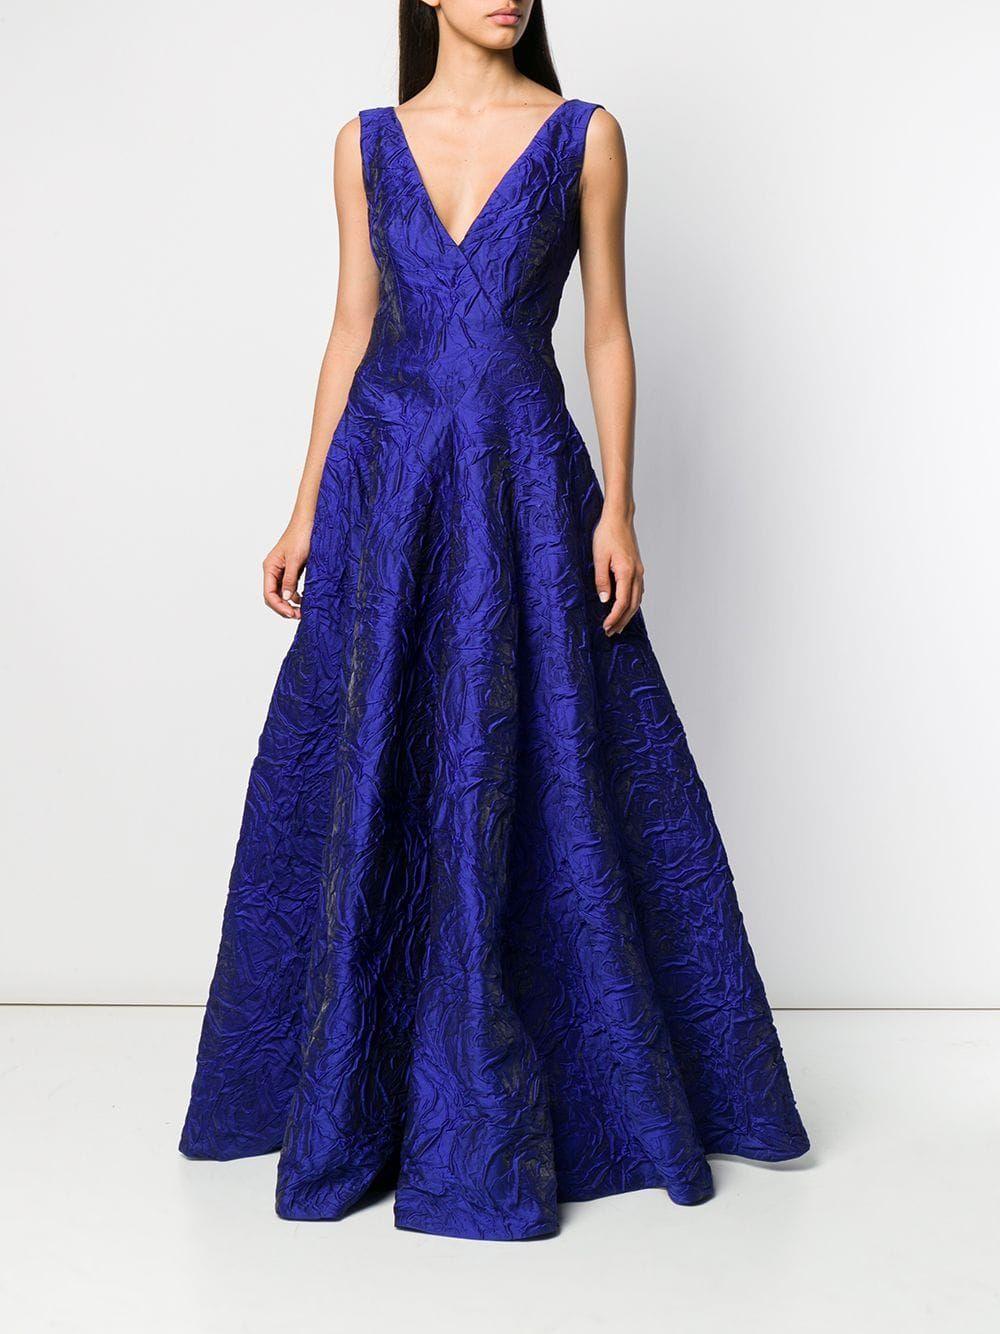 Talbot Runhof Tottori Dress Farfetch Dresses Talbots Royal Blue Dresses [ 1334 x 1000 Pixel ]